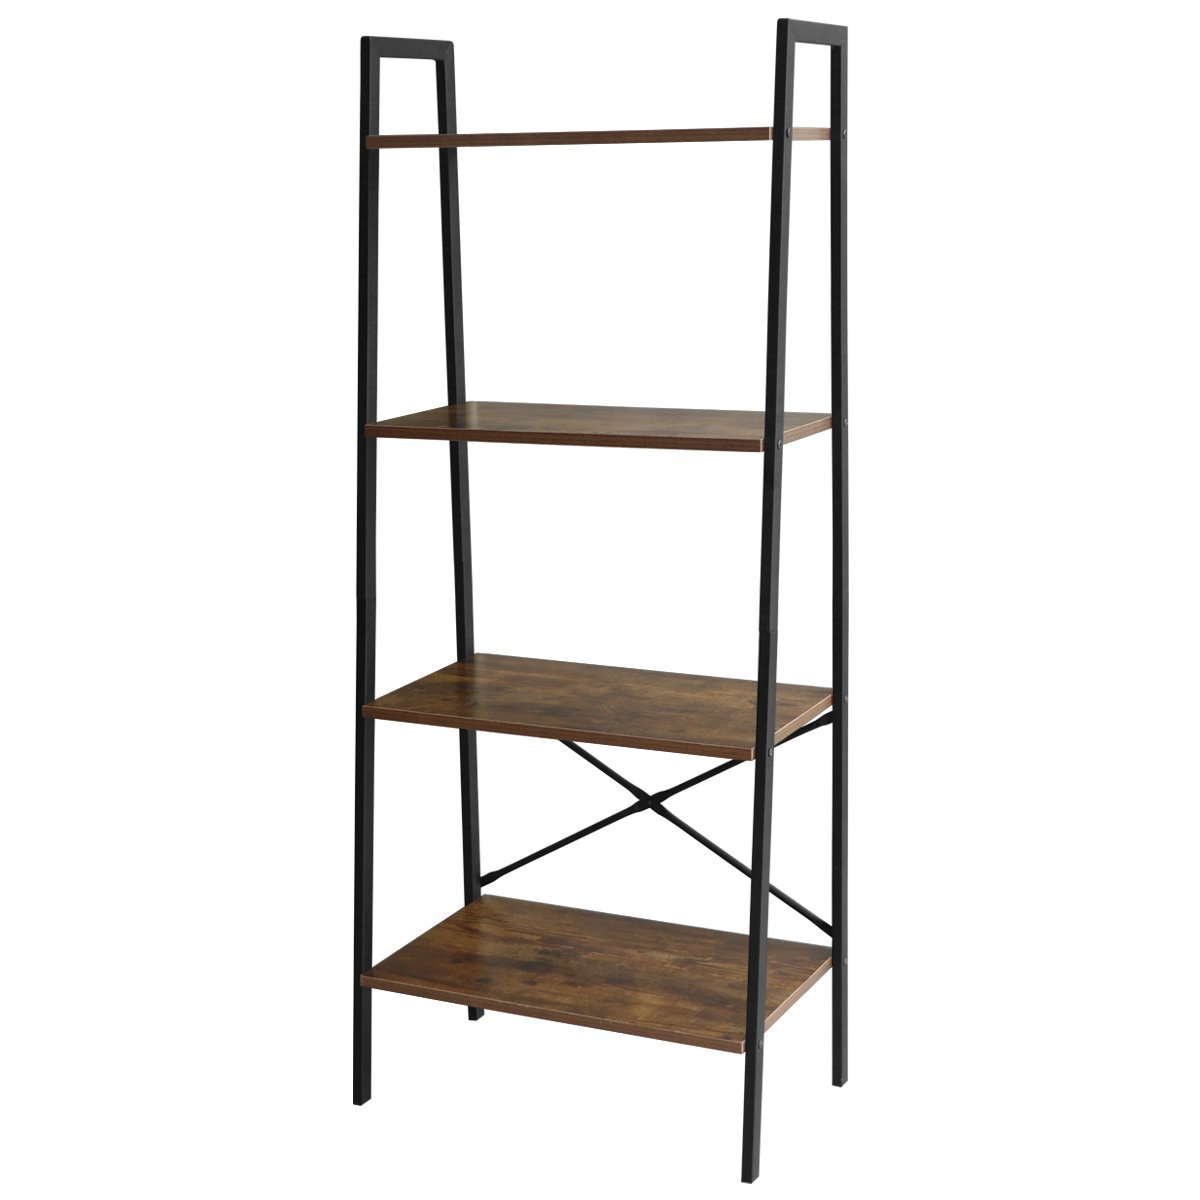 Lasuavy 4-Tier Ladder Shelf Bookcase Multifunctional Book Rack Storage Shelves Plant Flower Stand Rack, Premium Wood Furniture for Home, Office, Bathroom, Living Room